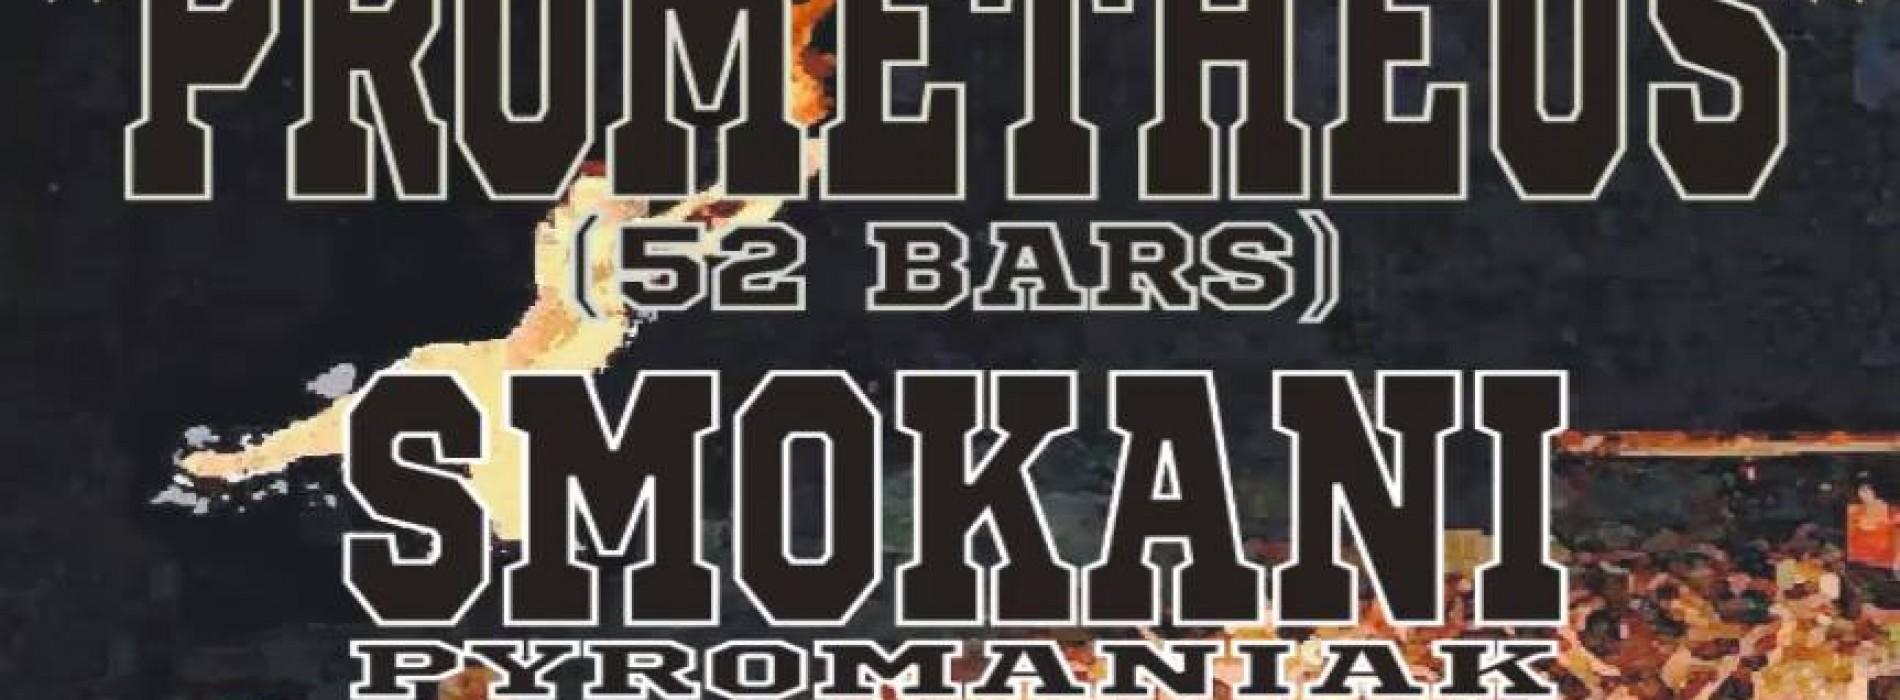 Smokani – Prometheus (52 Bars)